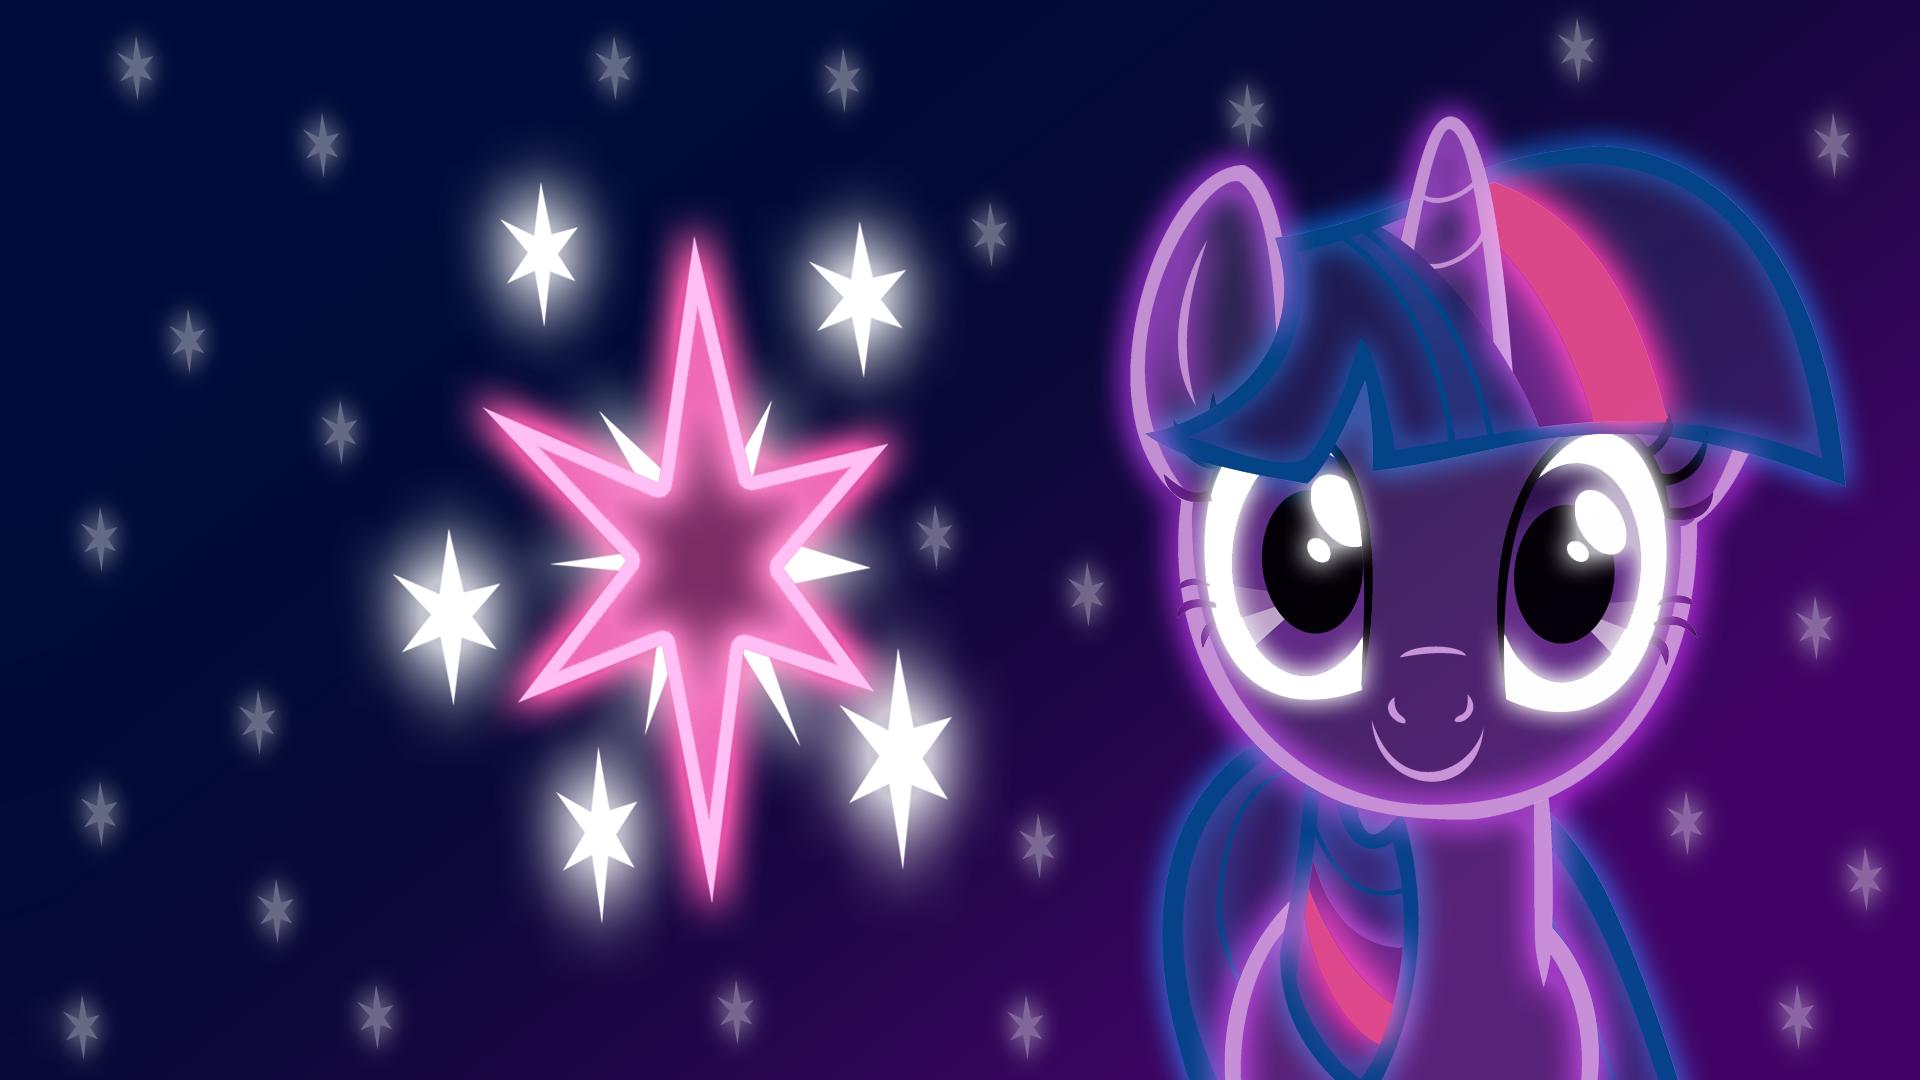 twilight sparkle pony friendship magic wallpapers little 1920x1080 1920x1080